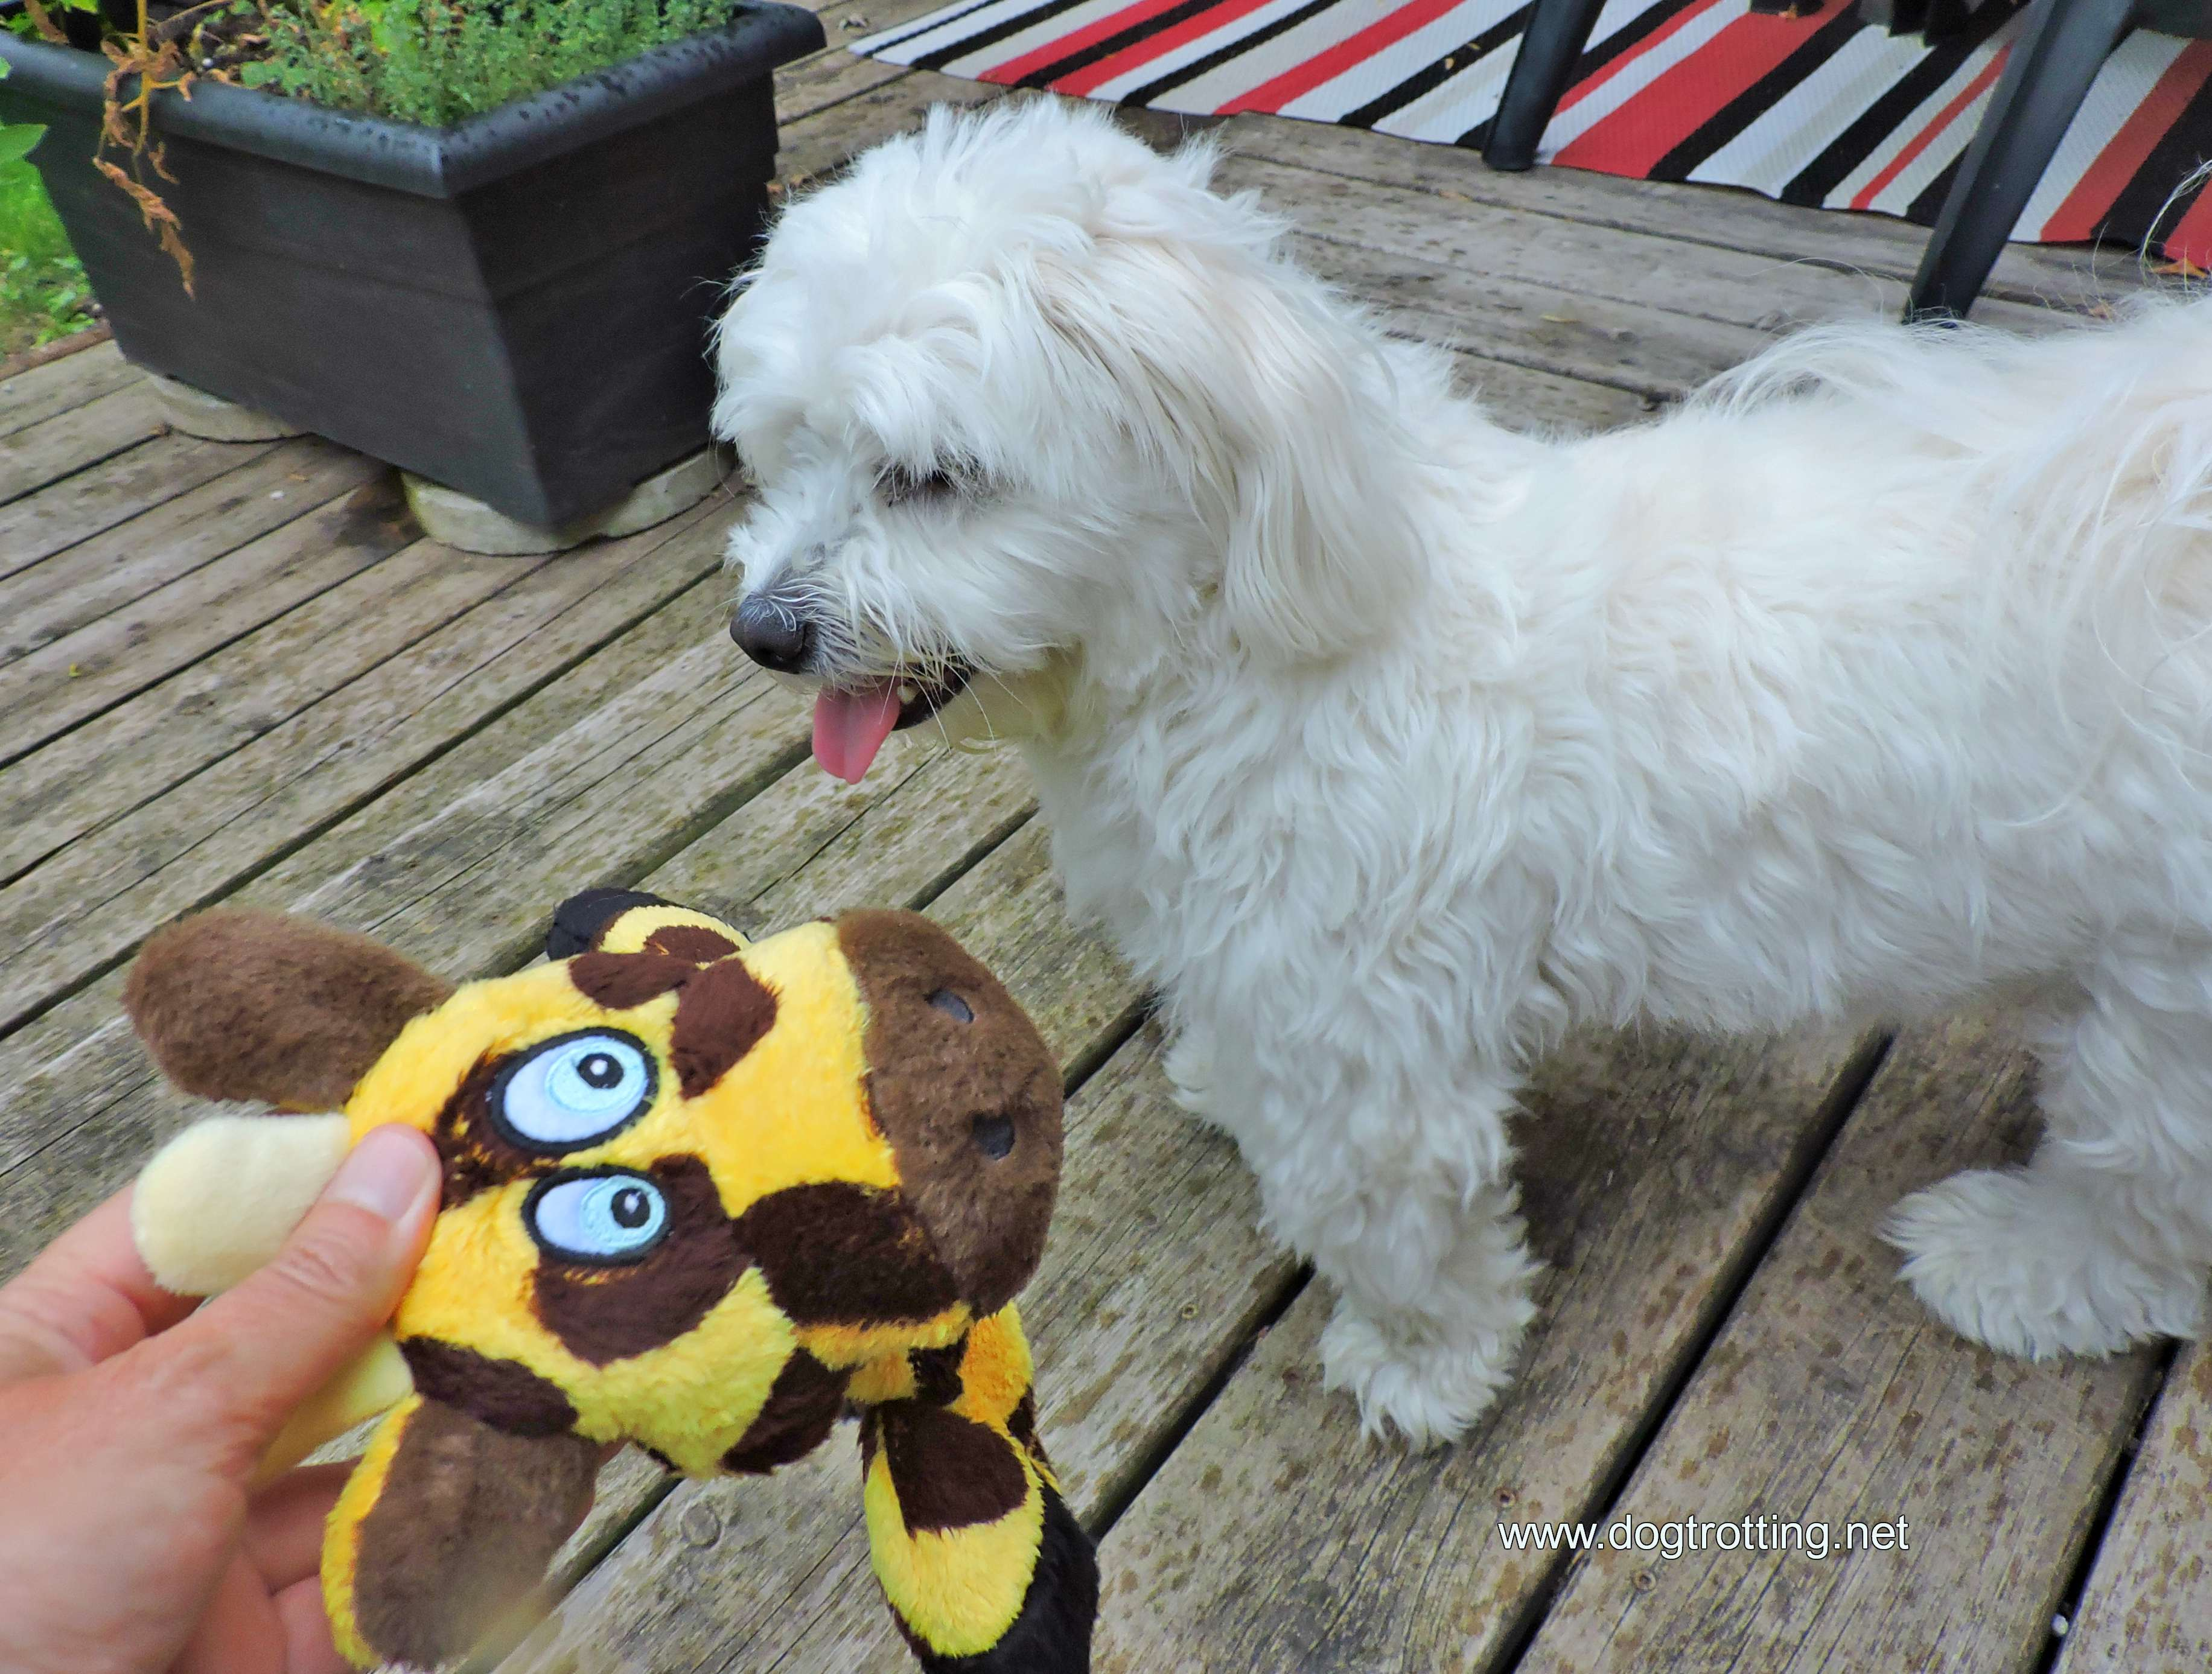 white dog with Hear Doggy dog toy